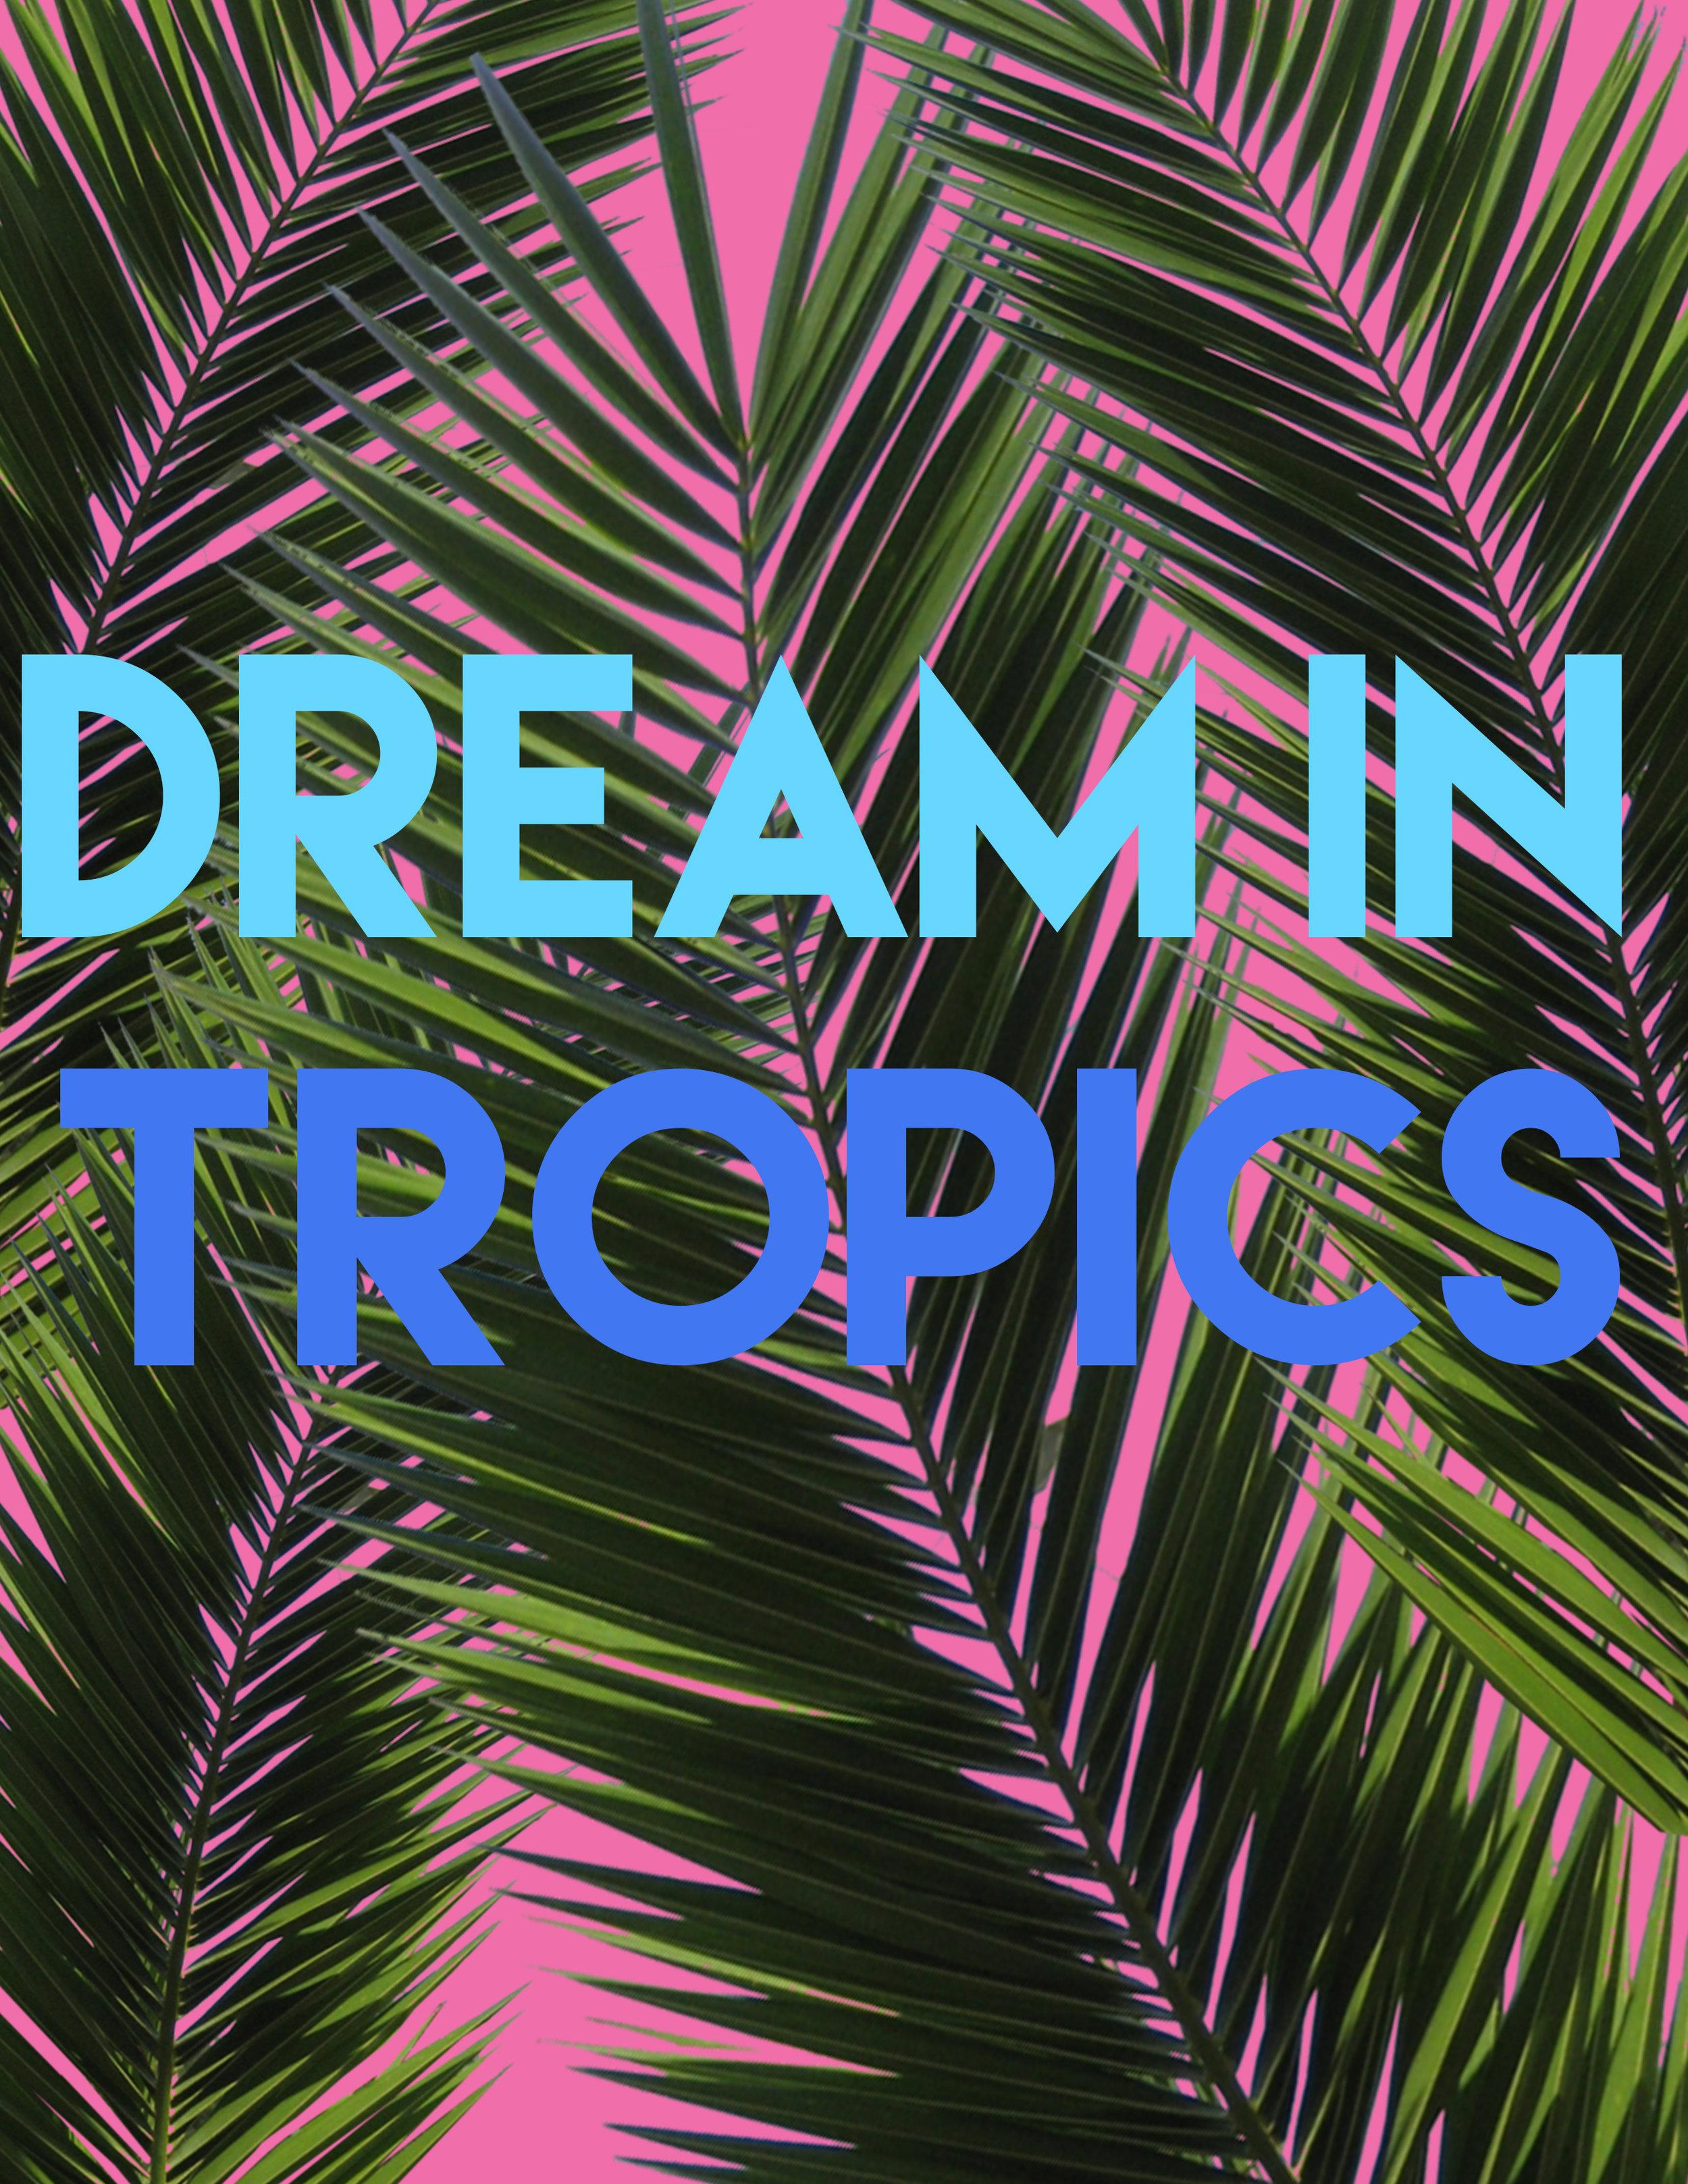 dream in tropics.jpg